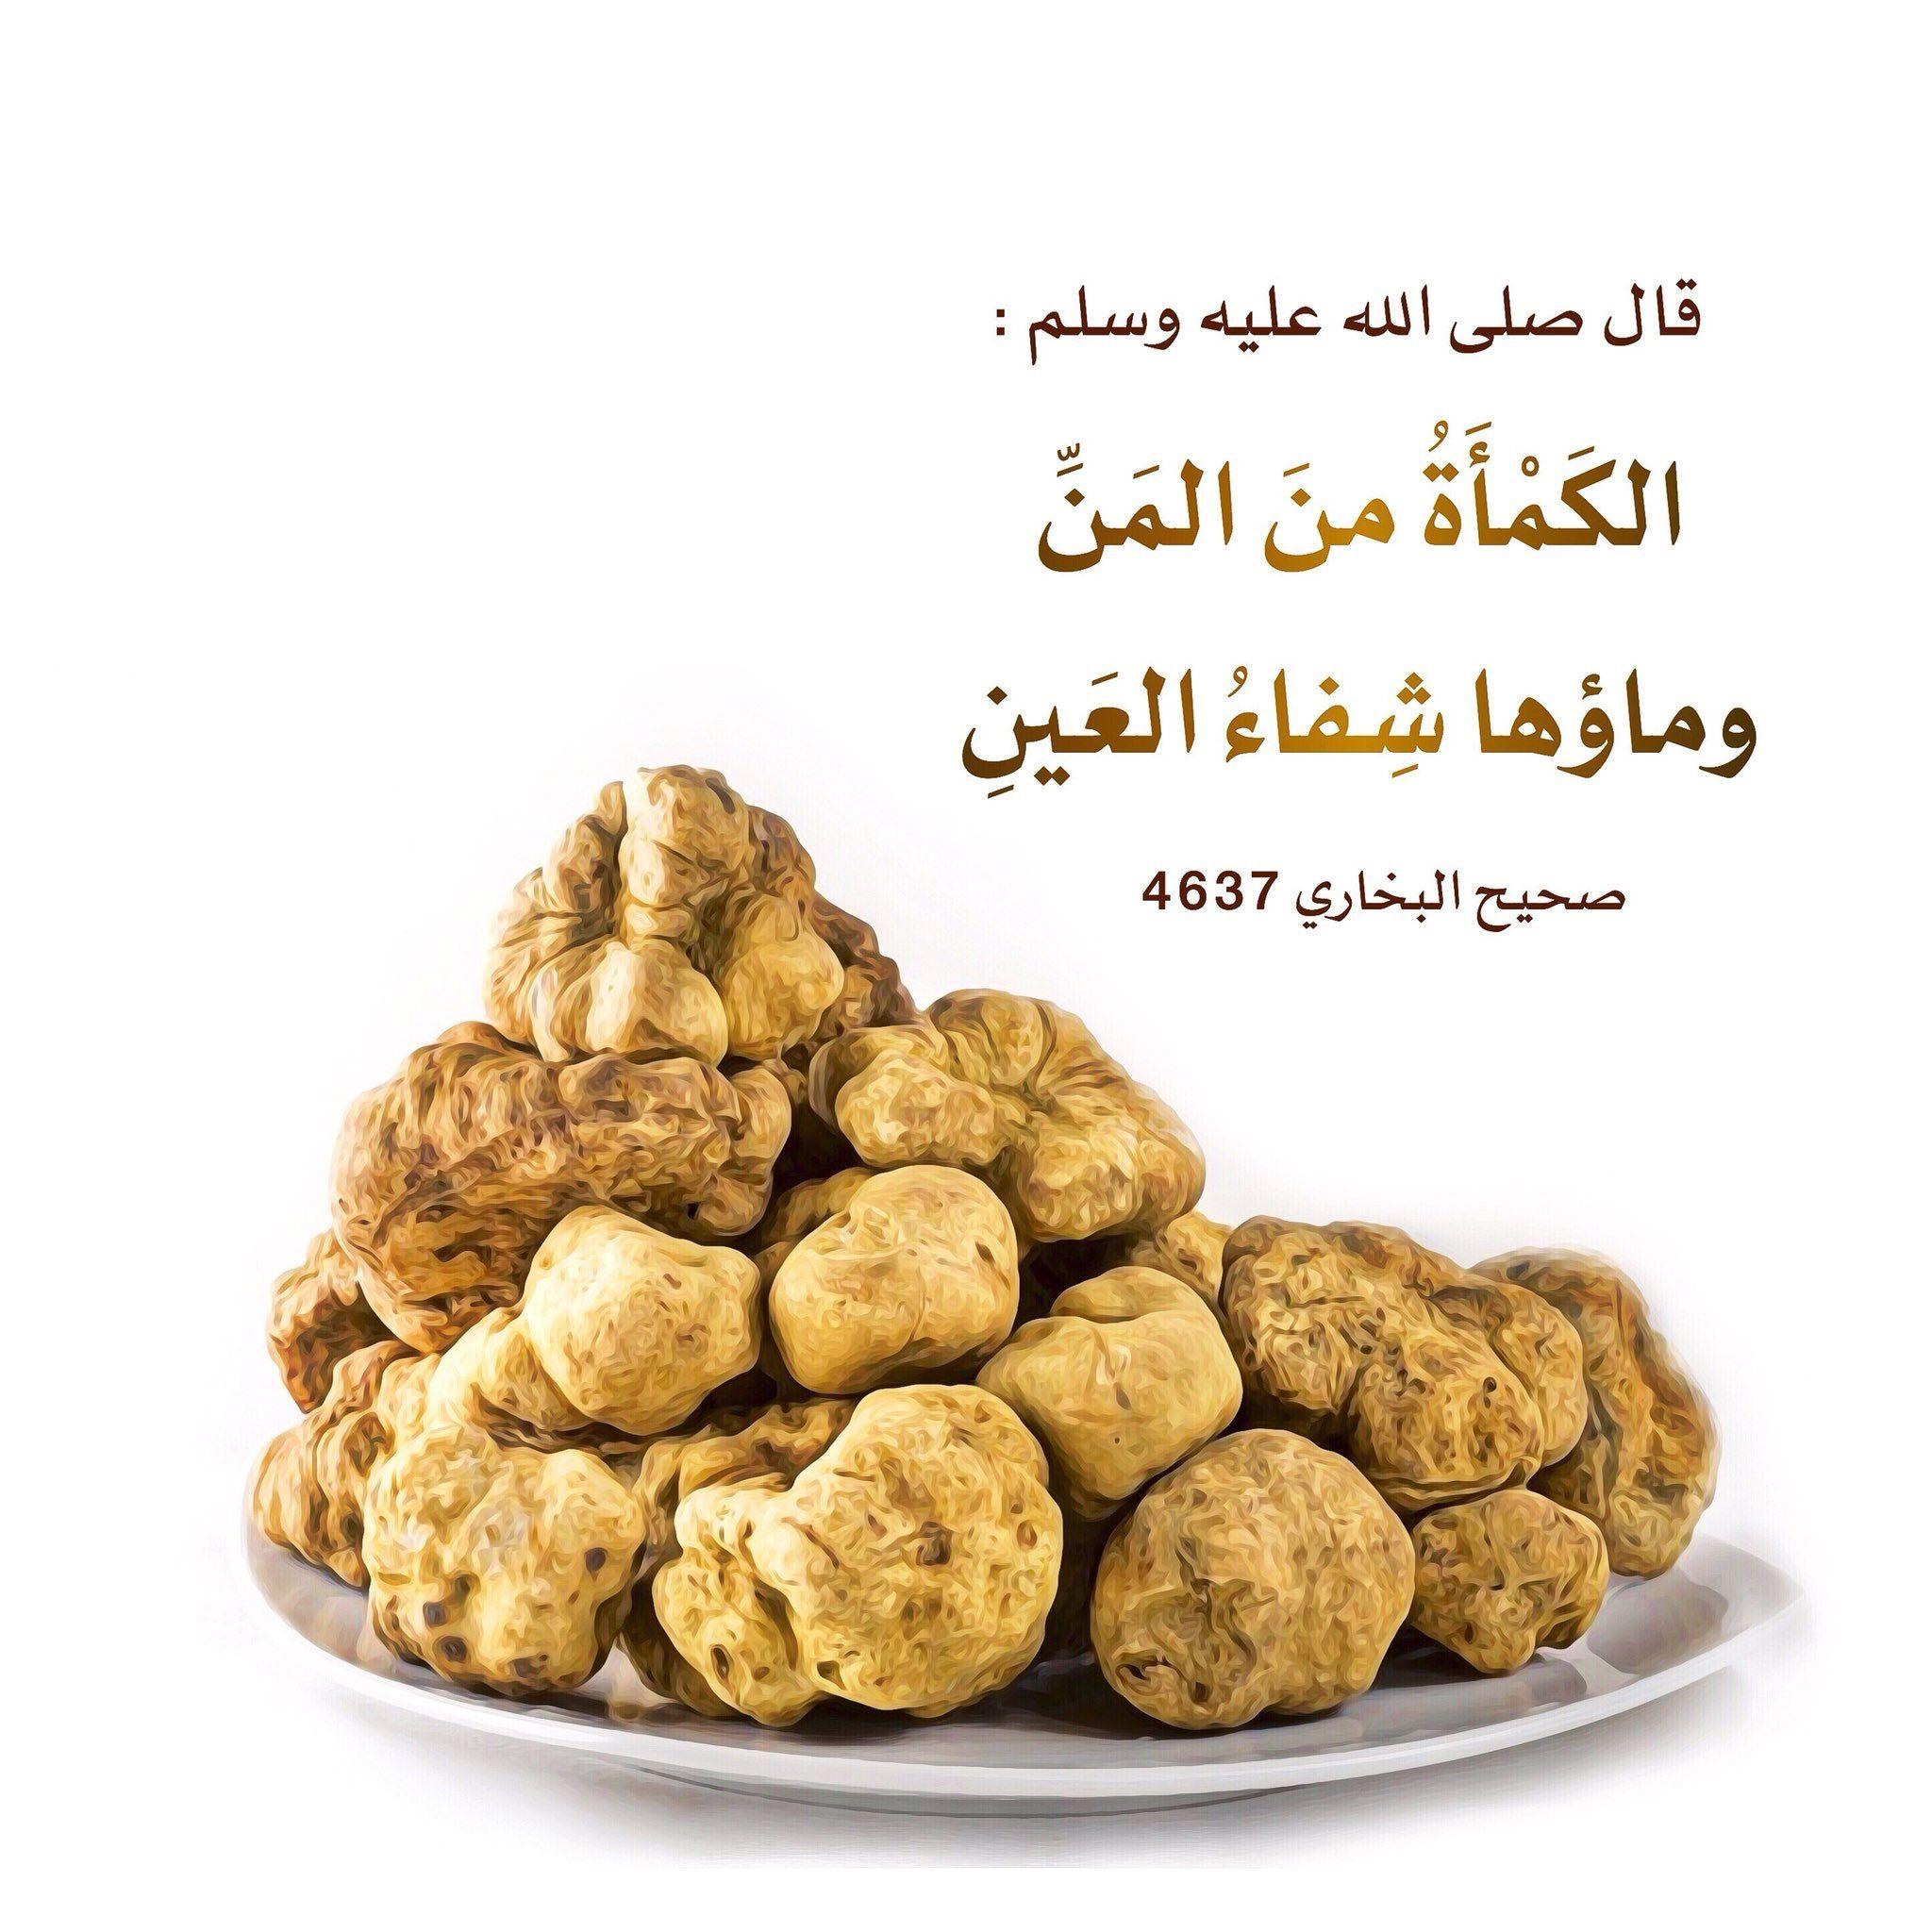 Pin By الأثر الجميل On أحاديث نبوية Halal Recipes Food Ahadith